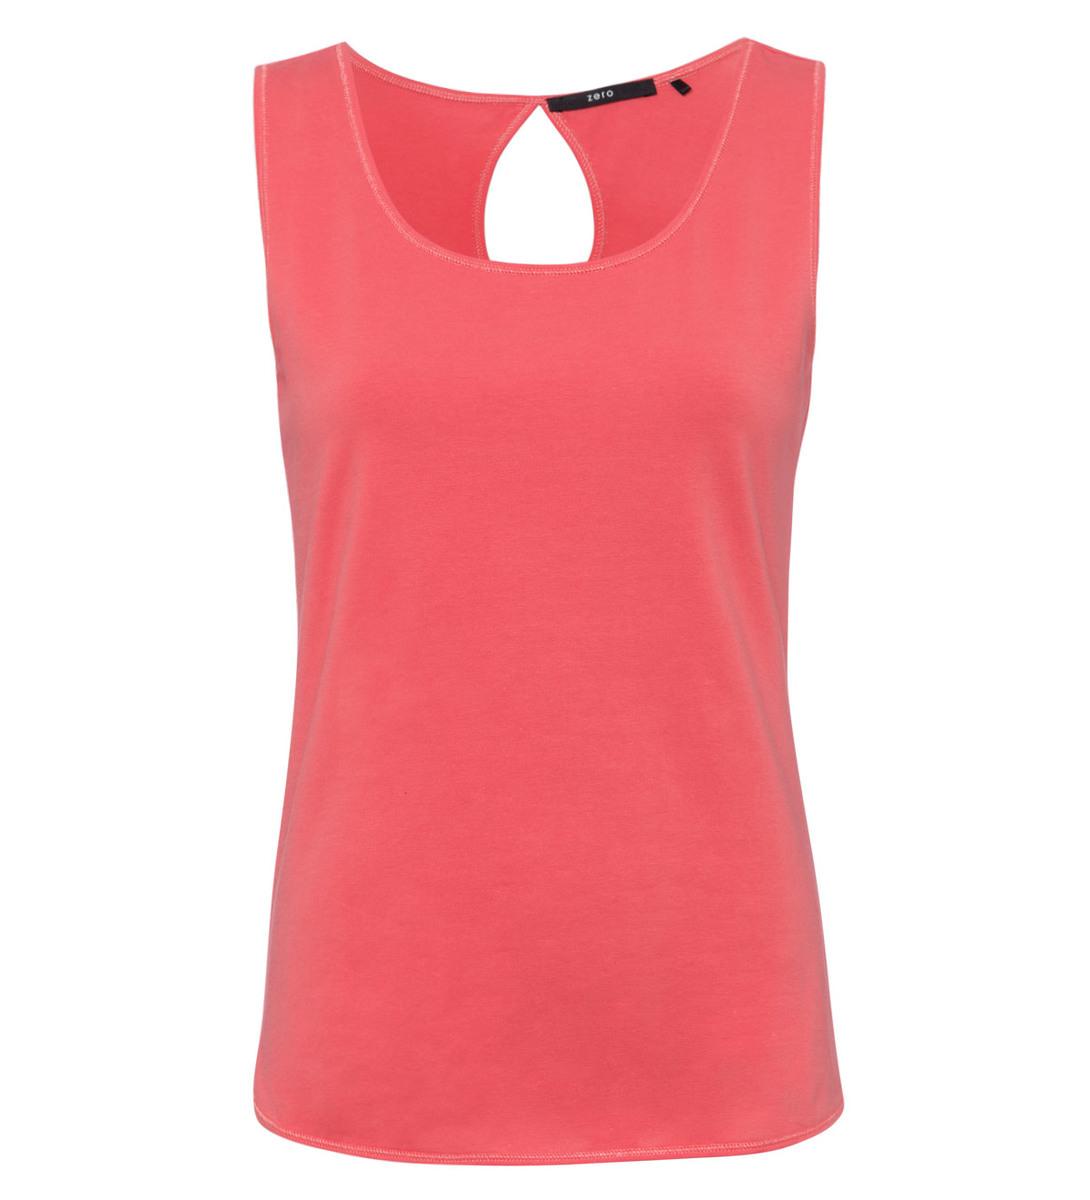 T-Shirt im Basic-Look in soft melon